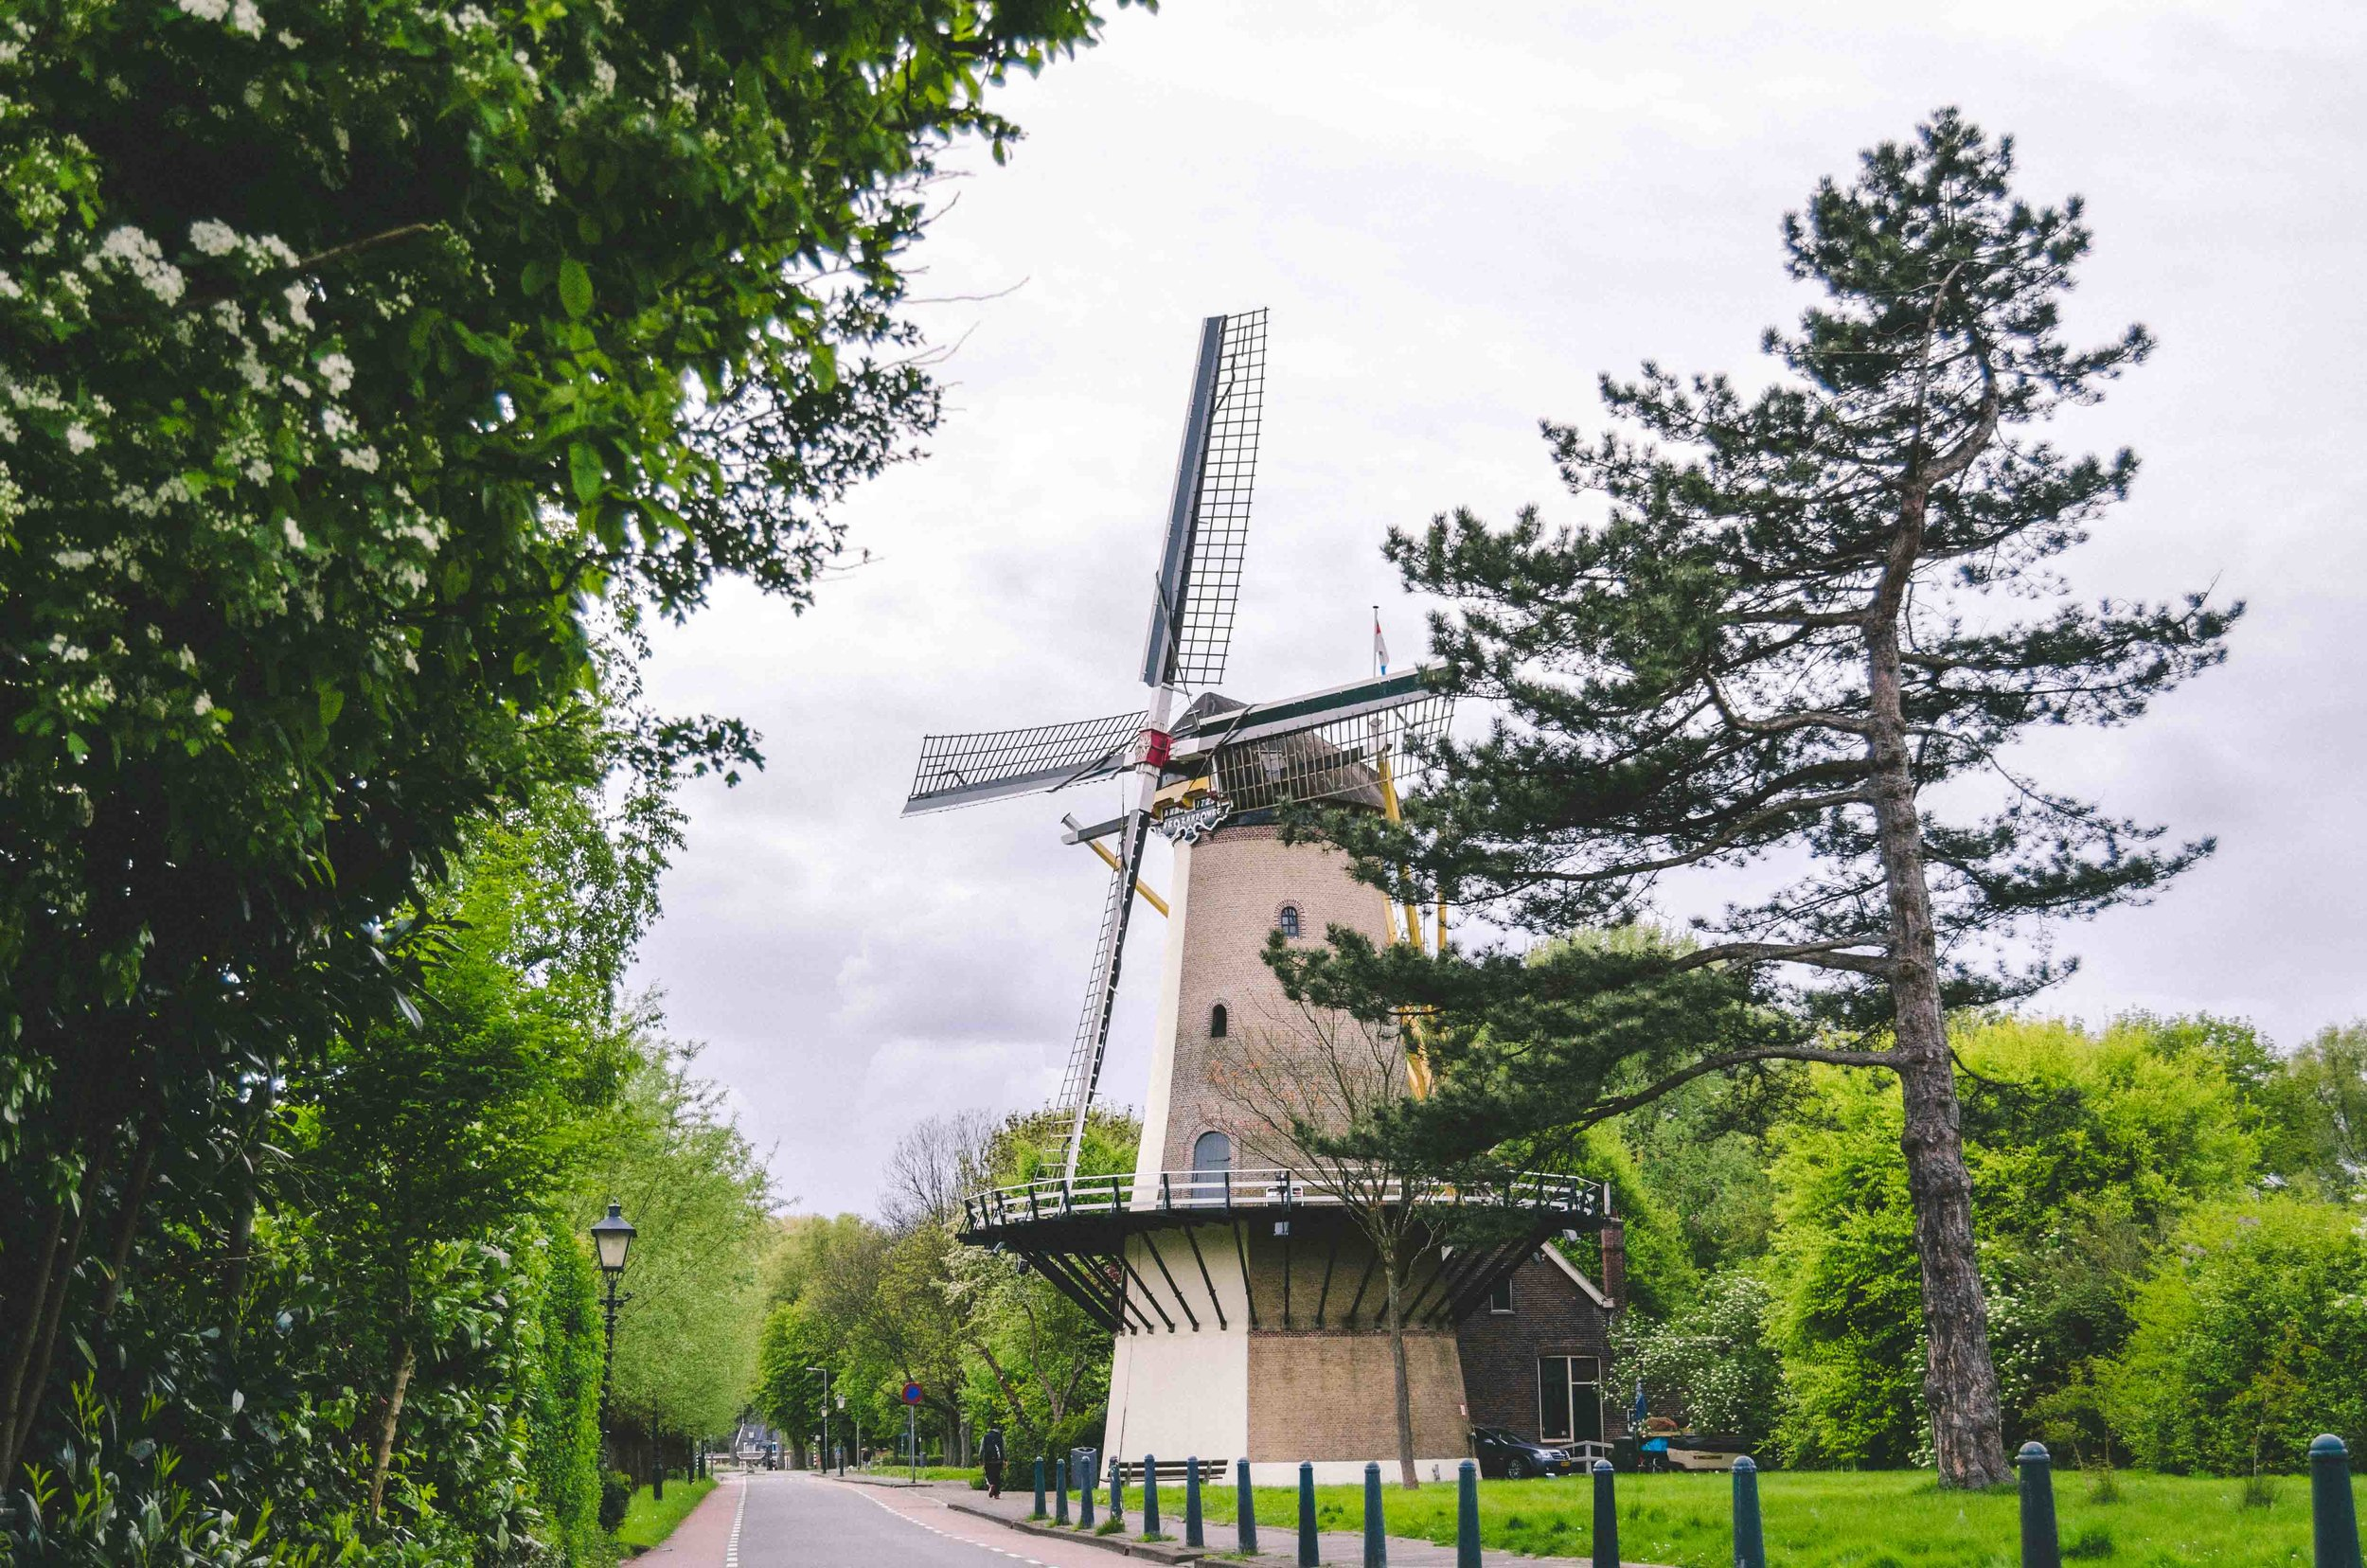 De Zandweg, a mill near the  Zuiderpark  in Charlois neighborhood